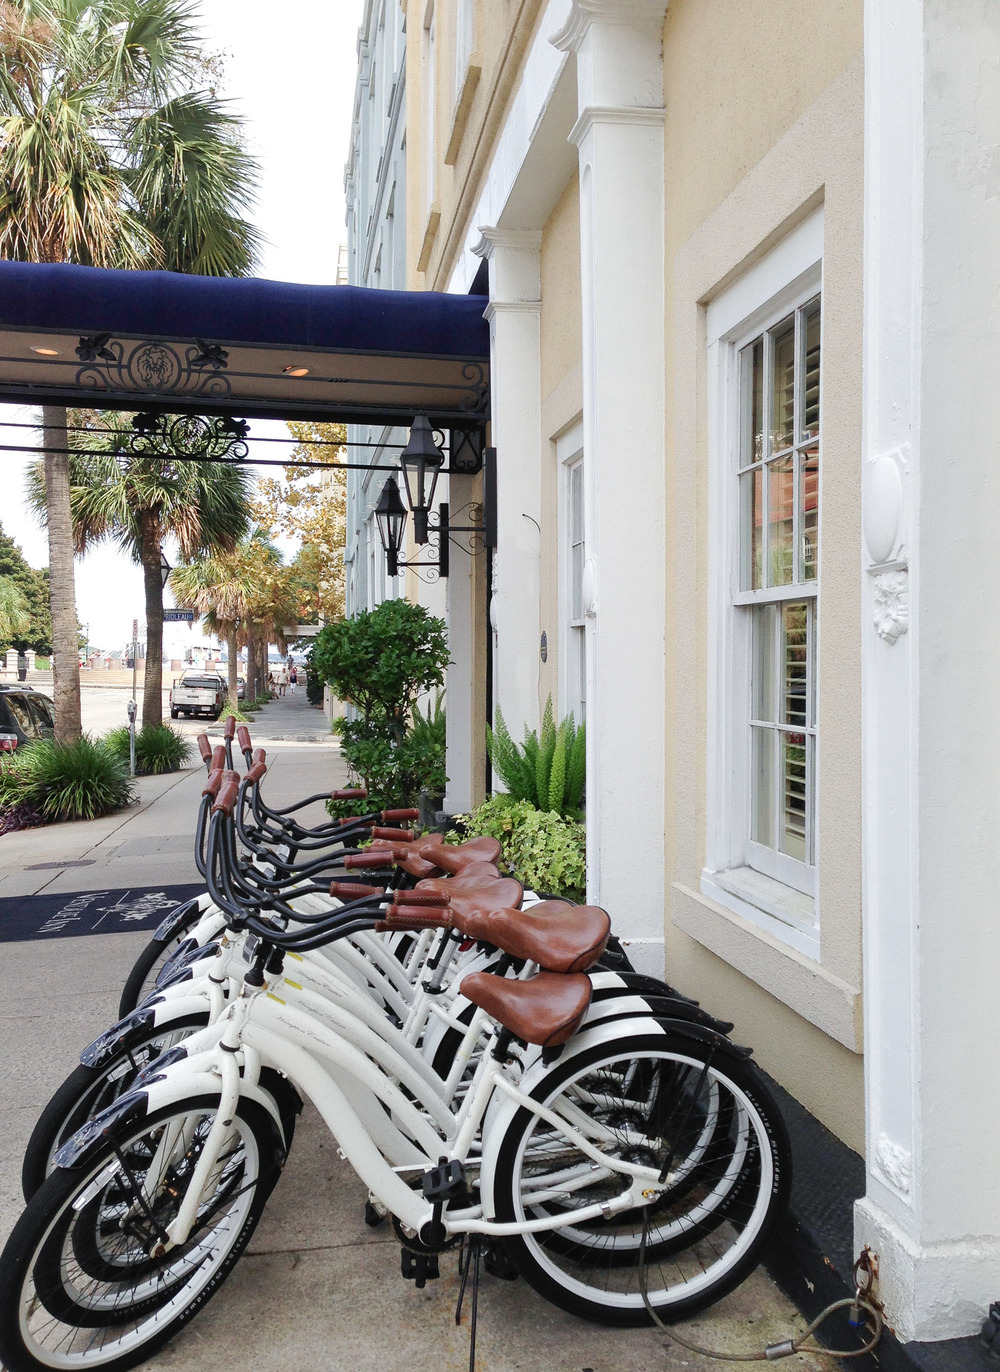 Bikes-2294.jpg